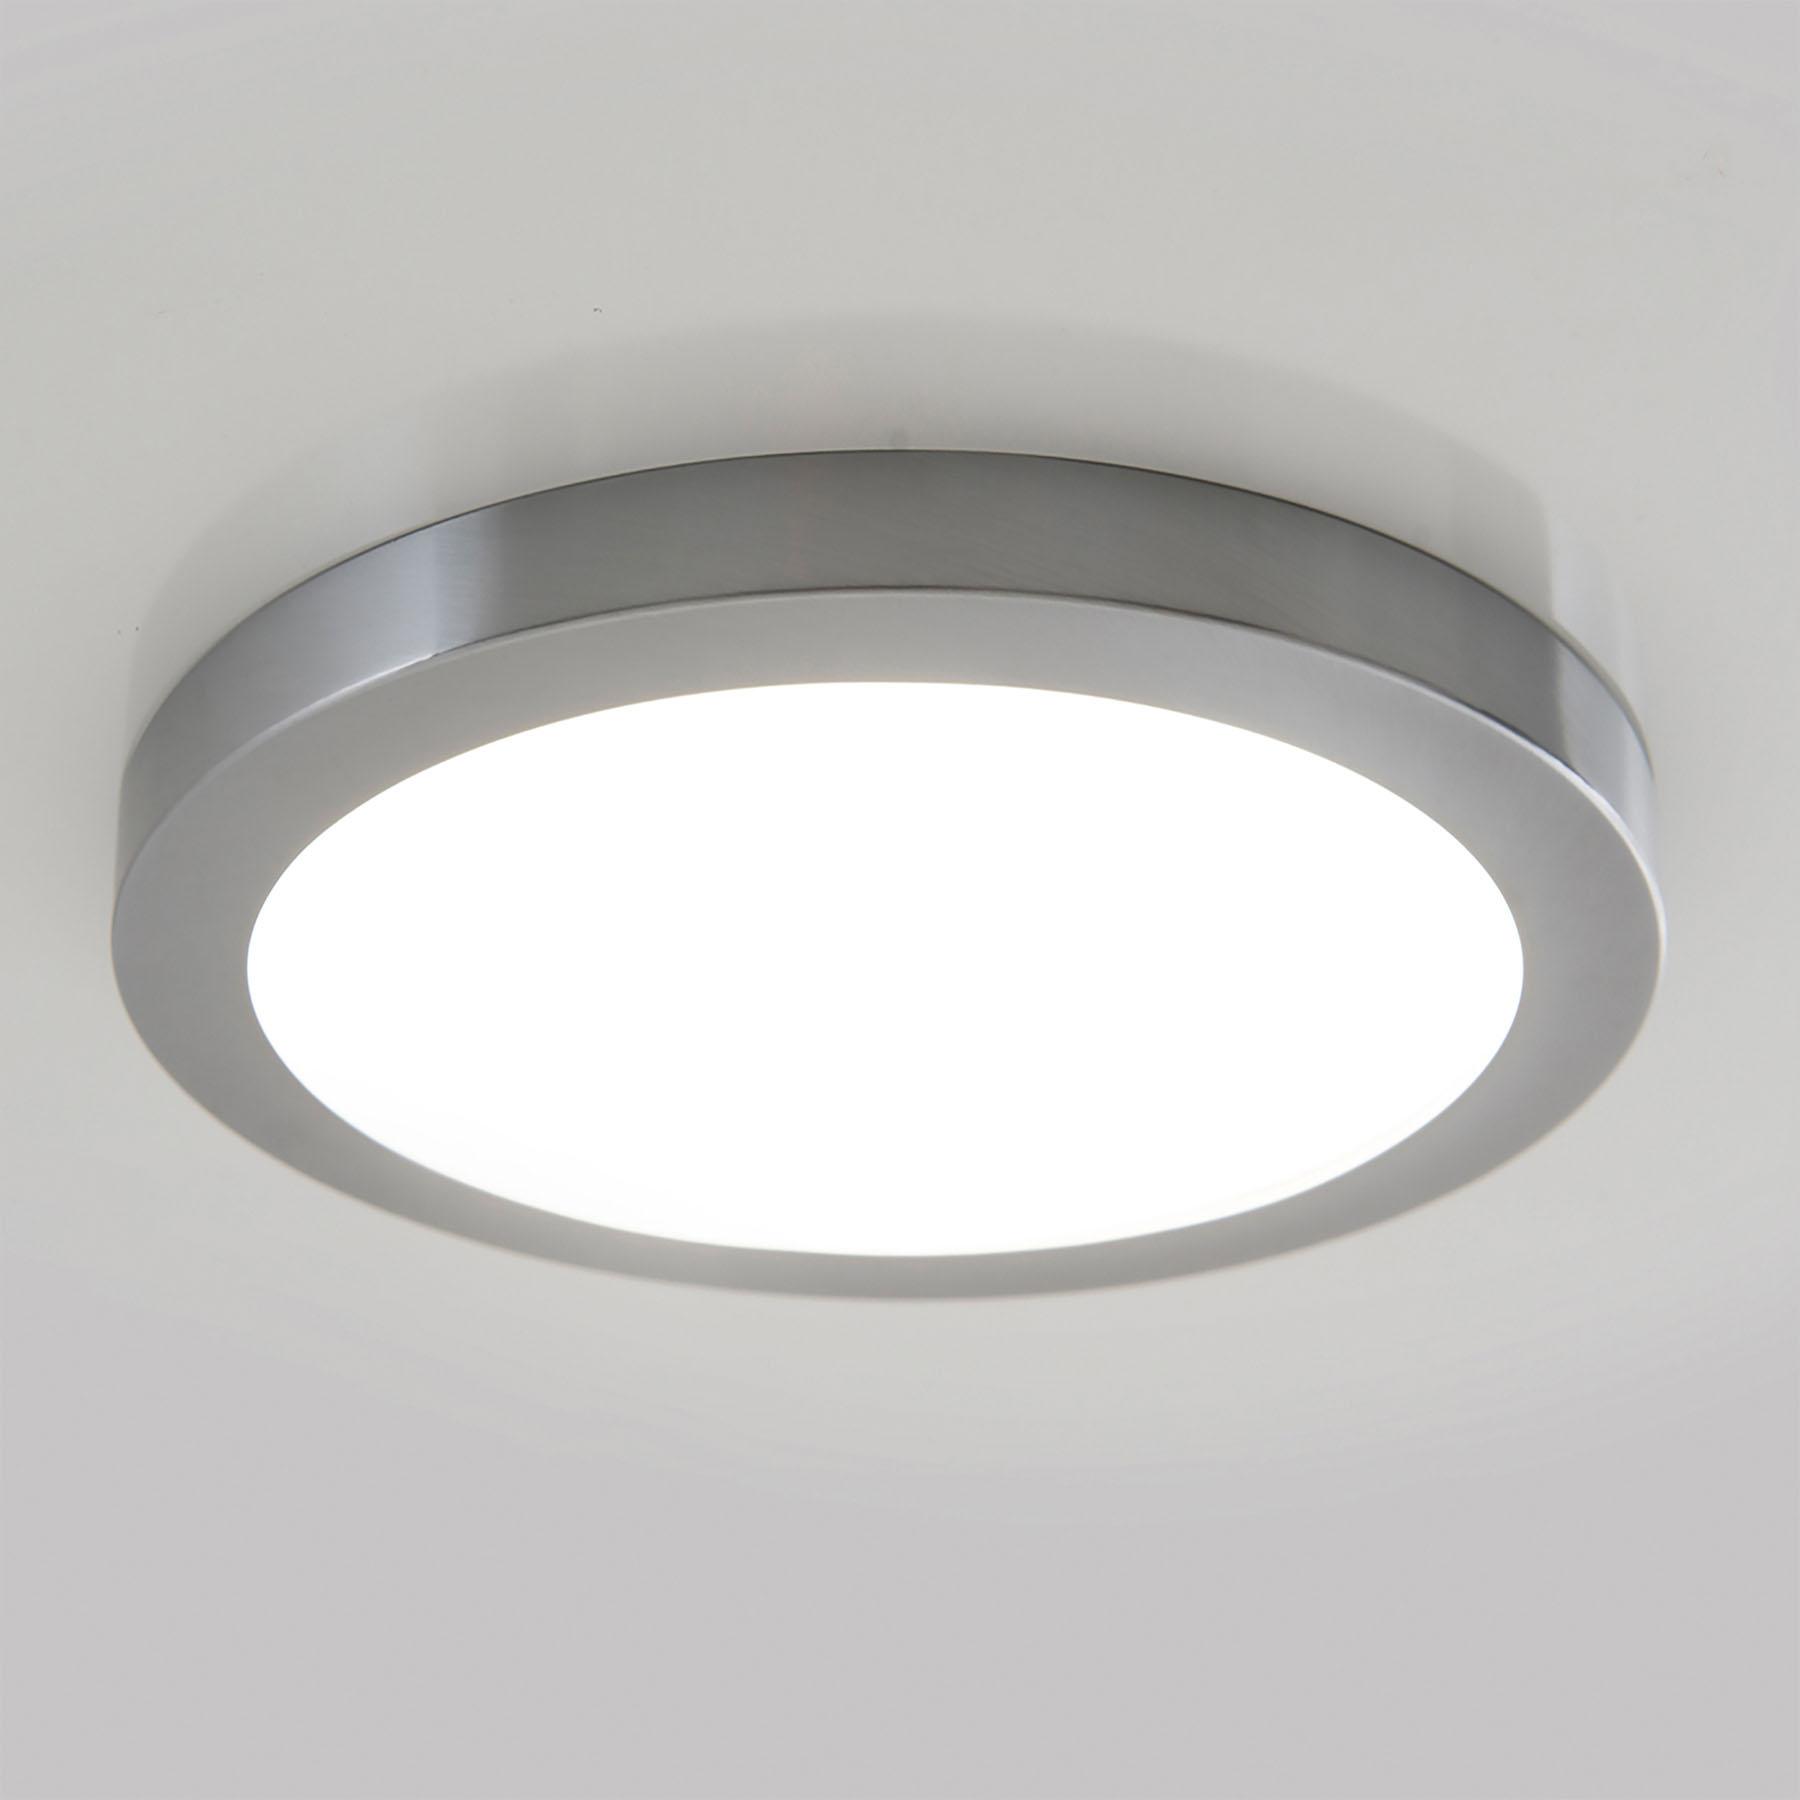 Lampa sufitowa LED Bonus magnes, Ø 22,5 cm